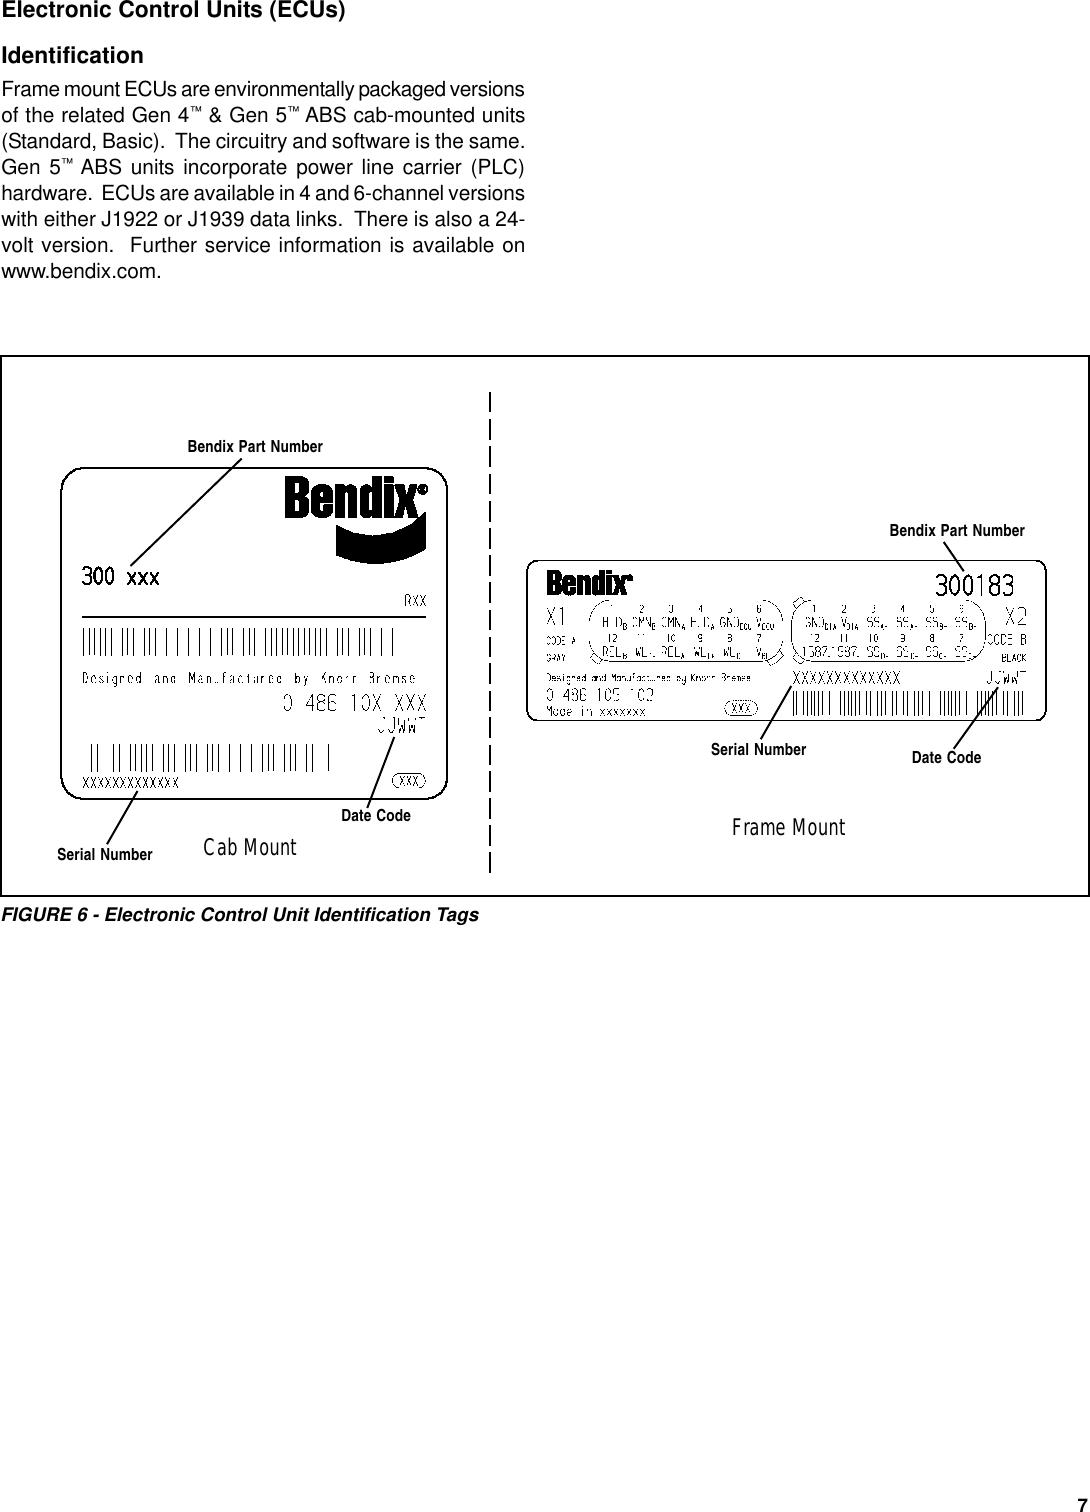 Bendix Bw2261 Users Manual 13 4746_1_to_13c